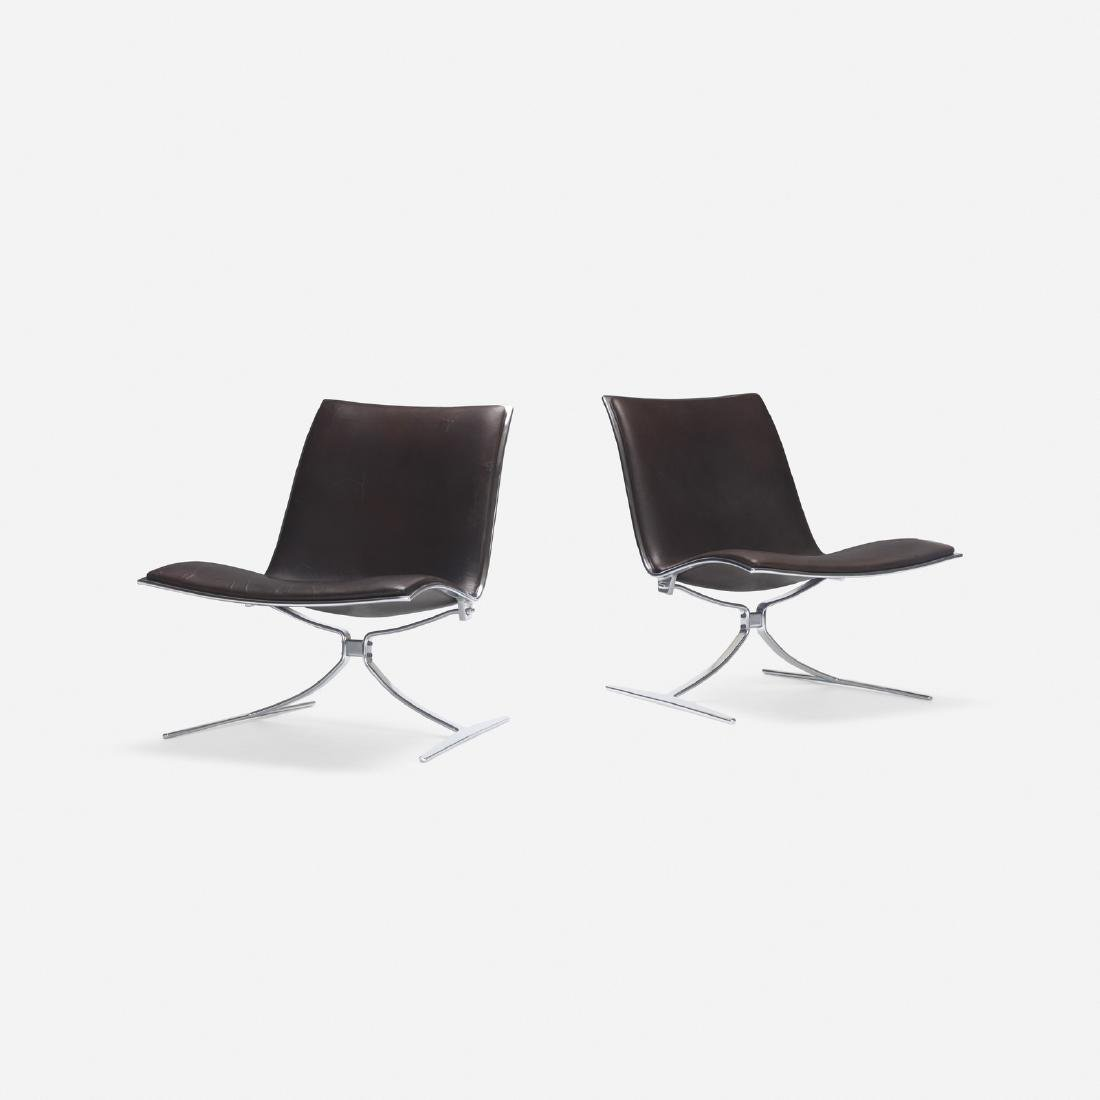 Jorgen Kastholm, Skater chairs, pair - 2